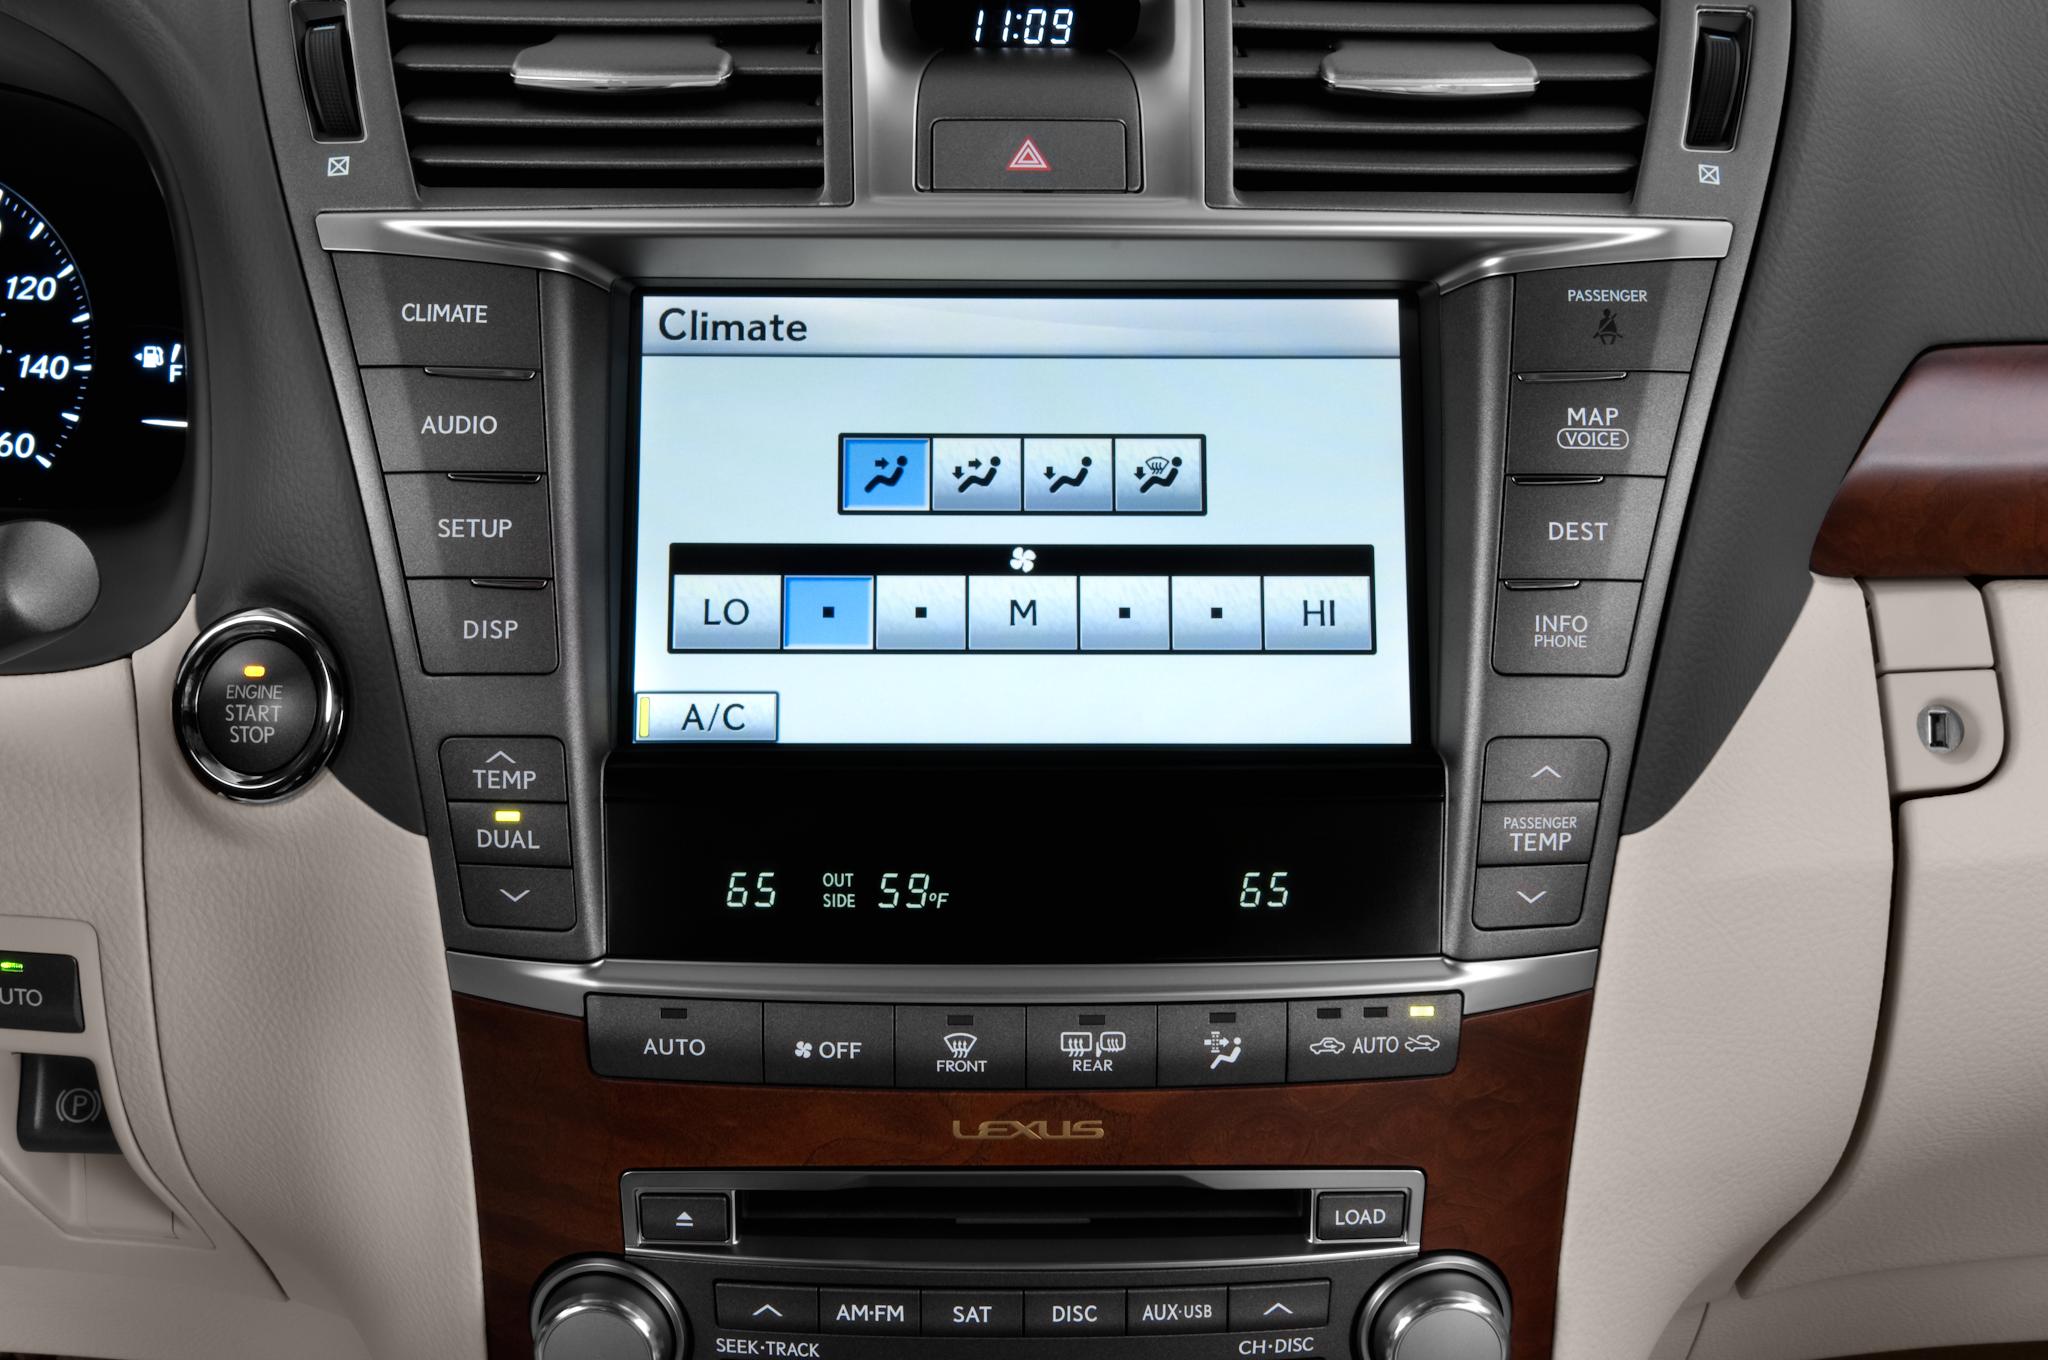 http://st.automobilemag.com/uploads/sites/10/2015/11/2010-lexus-ls-460-l-sedan-temp-control.png